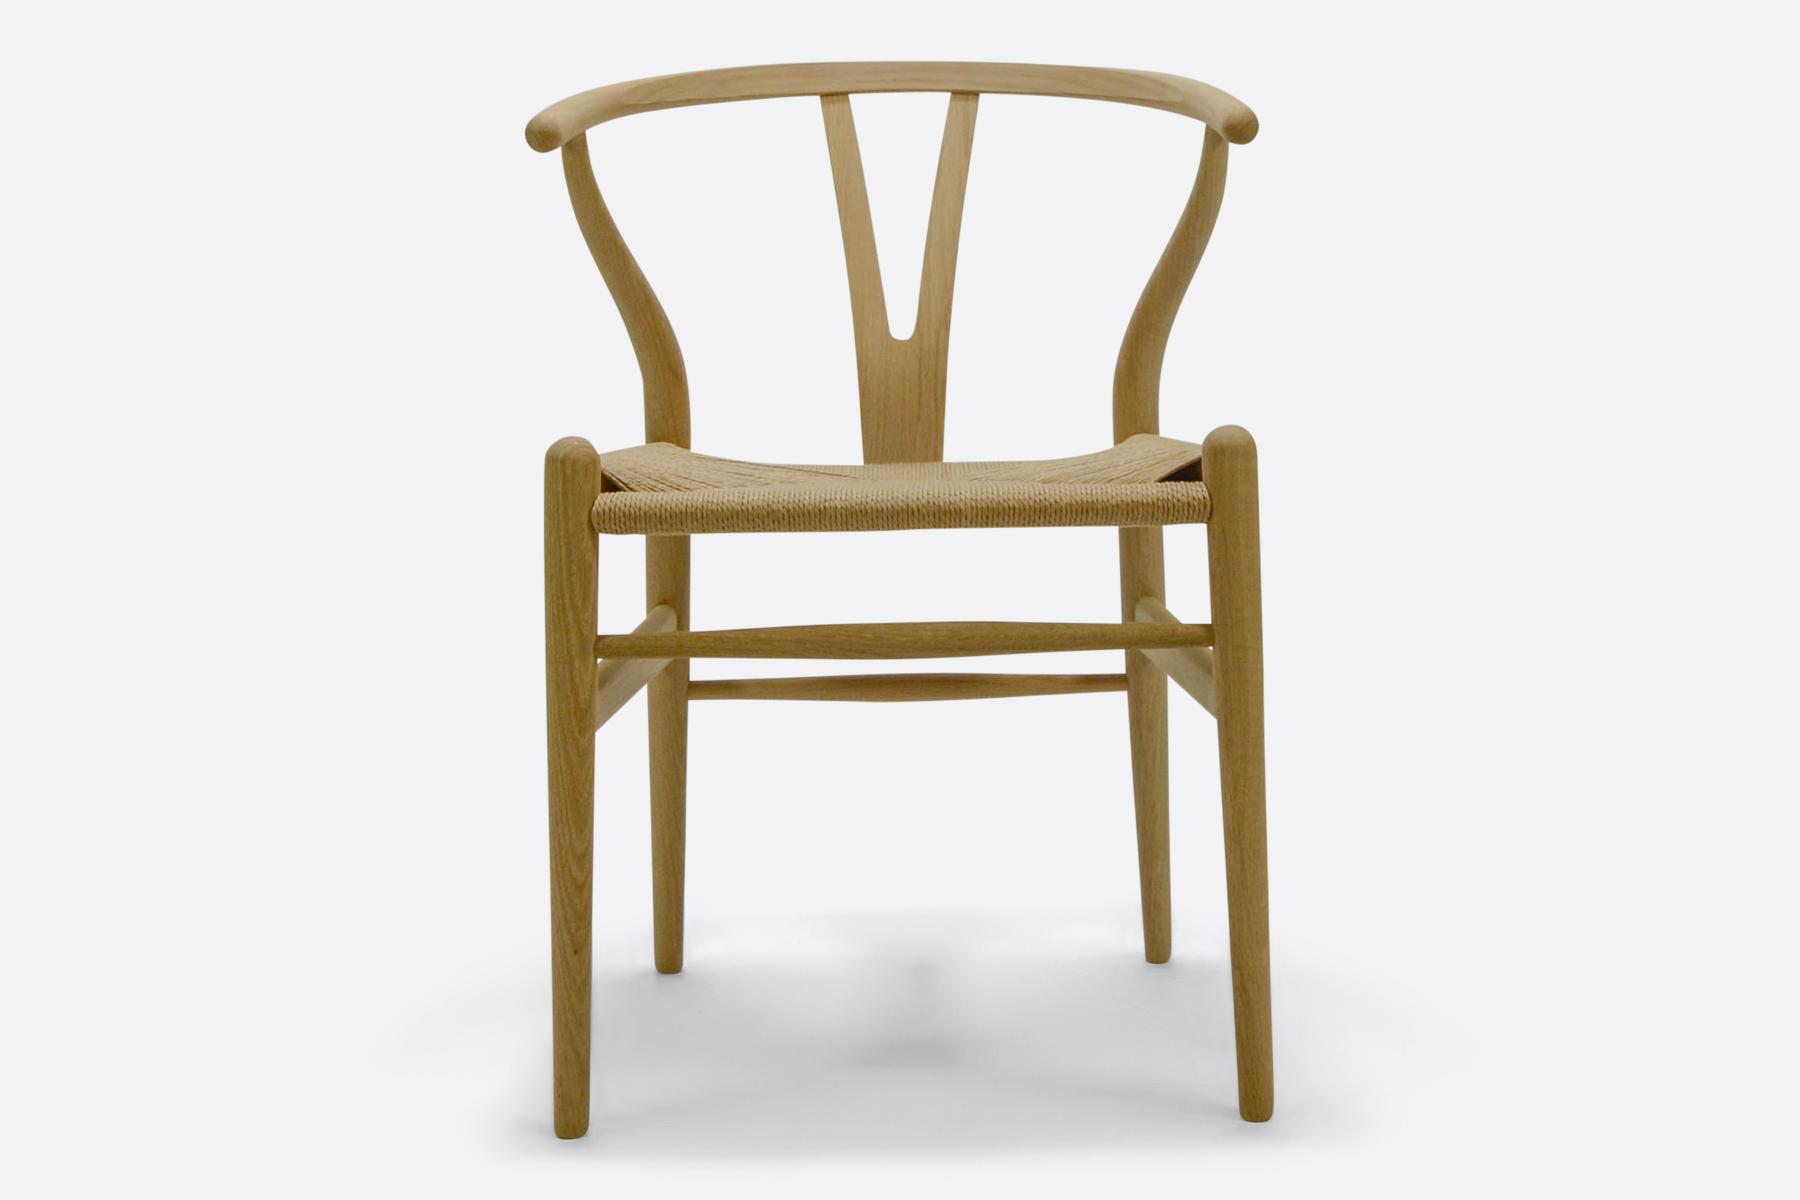 Carl Hansen & Son - Wishbone chair - soaped oak1